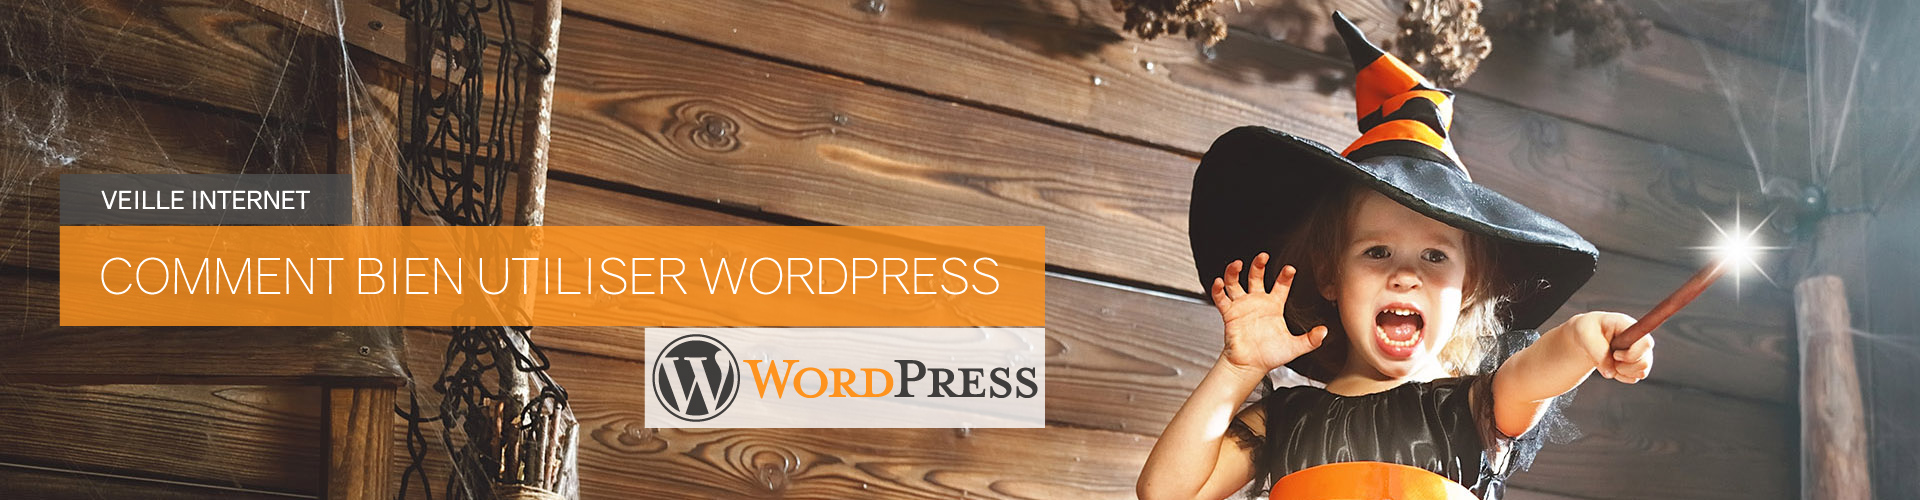 ban-veille-wordpress